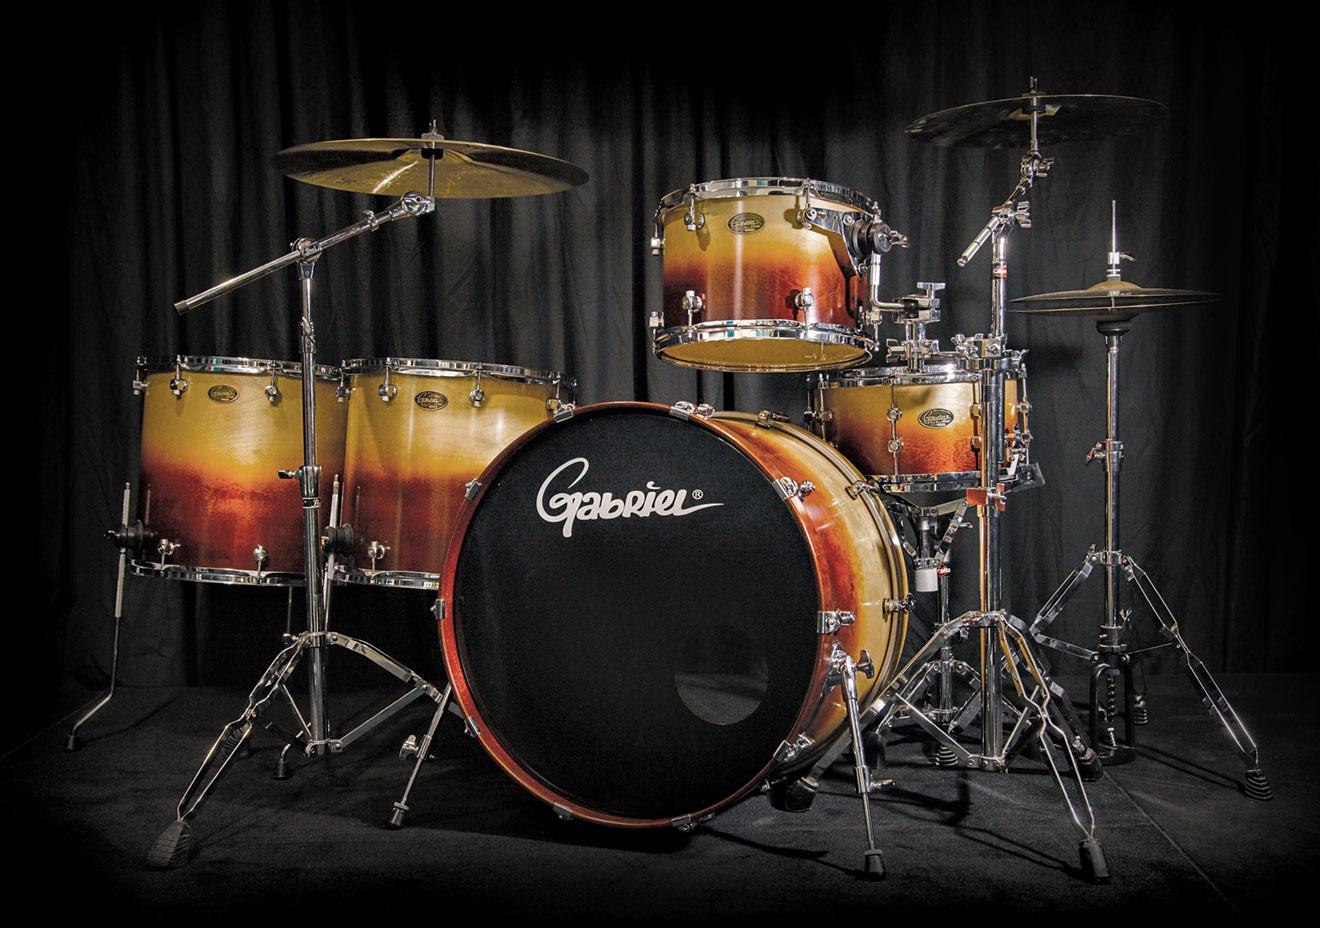 pro mini gabriel drum kit gabriel drums. Black Bedroom Furniture Sets. Home Design Ideas